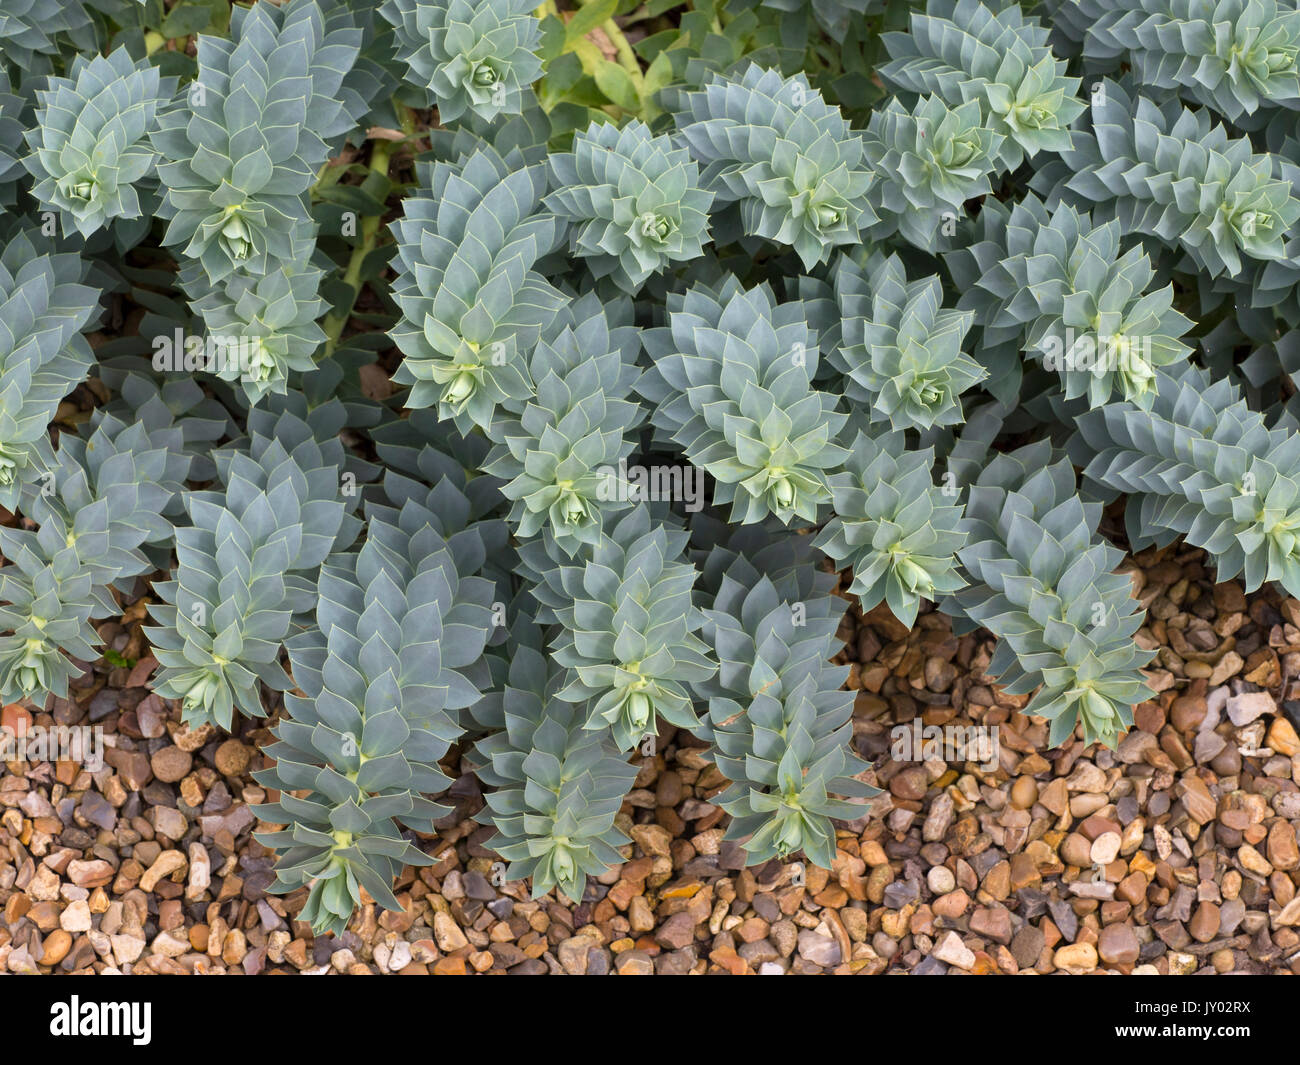 Euphorbia myrsinites growing on gravel - Stock Image